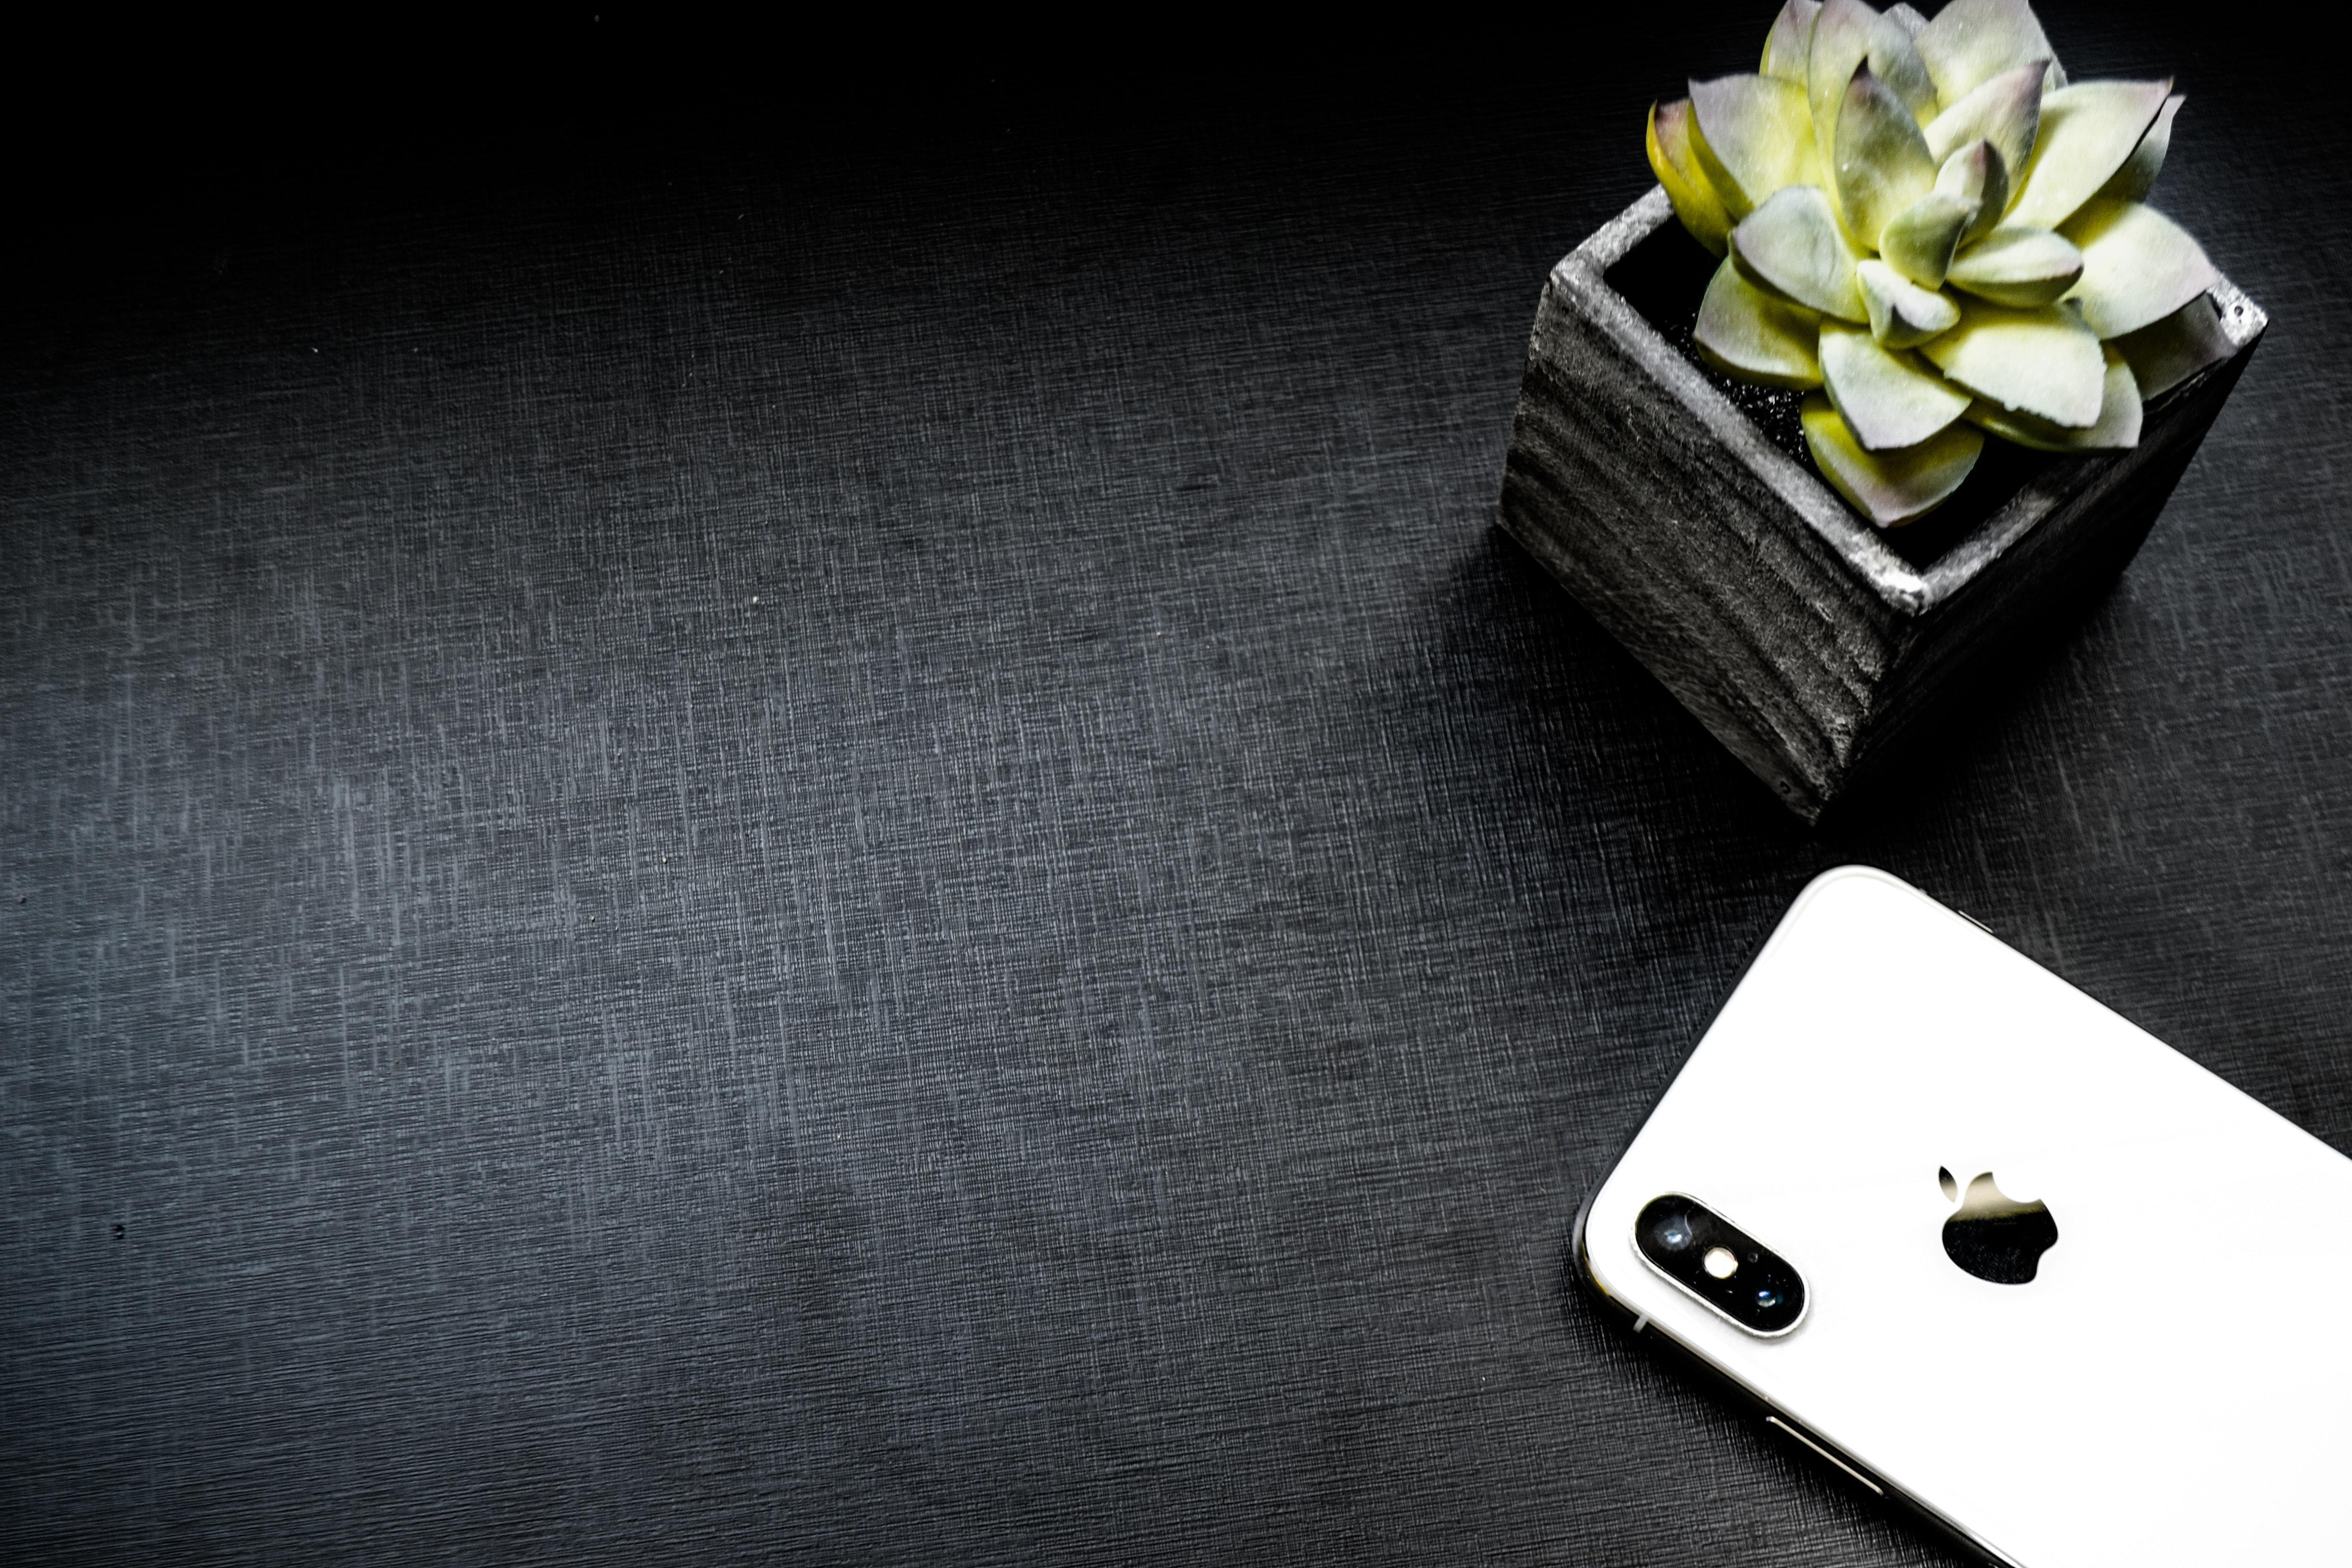 1000 interesting black background photos pexels free stock photos fetching more photos mightylinksfo